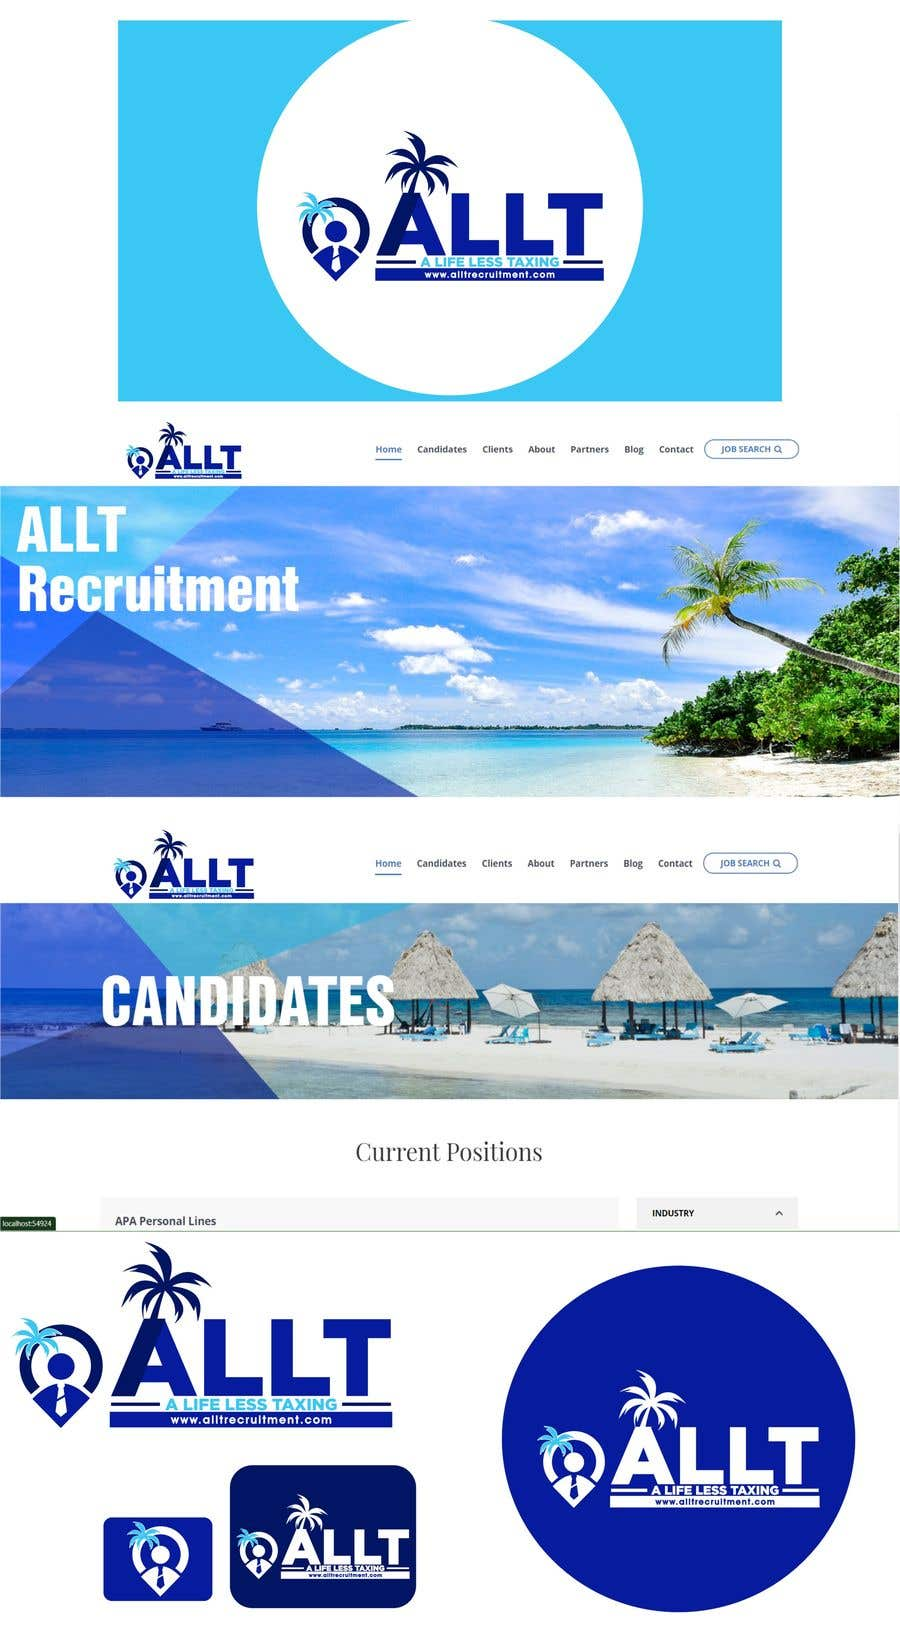 Penyertaan Peraduan #                                        333                                      untuk                                         Logo Design for Recruitment Website